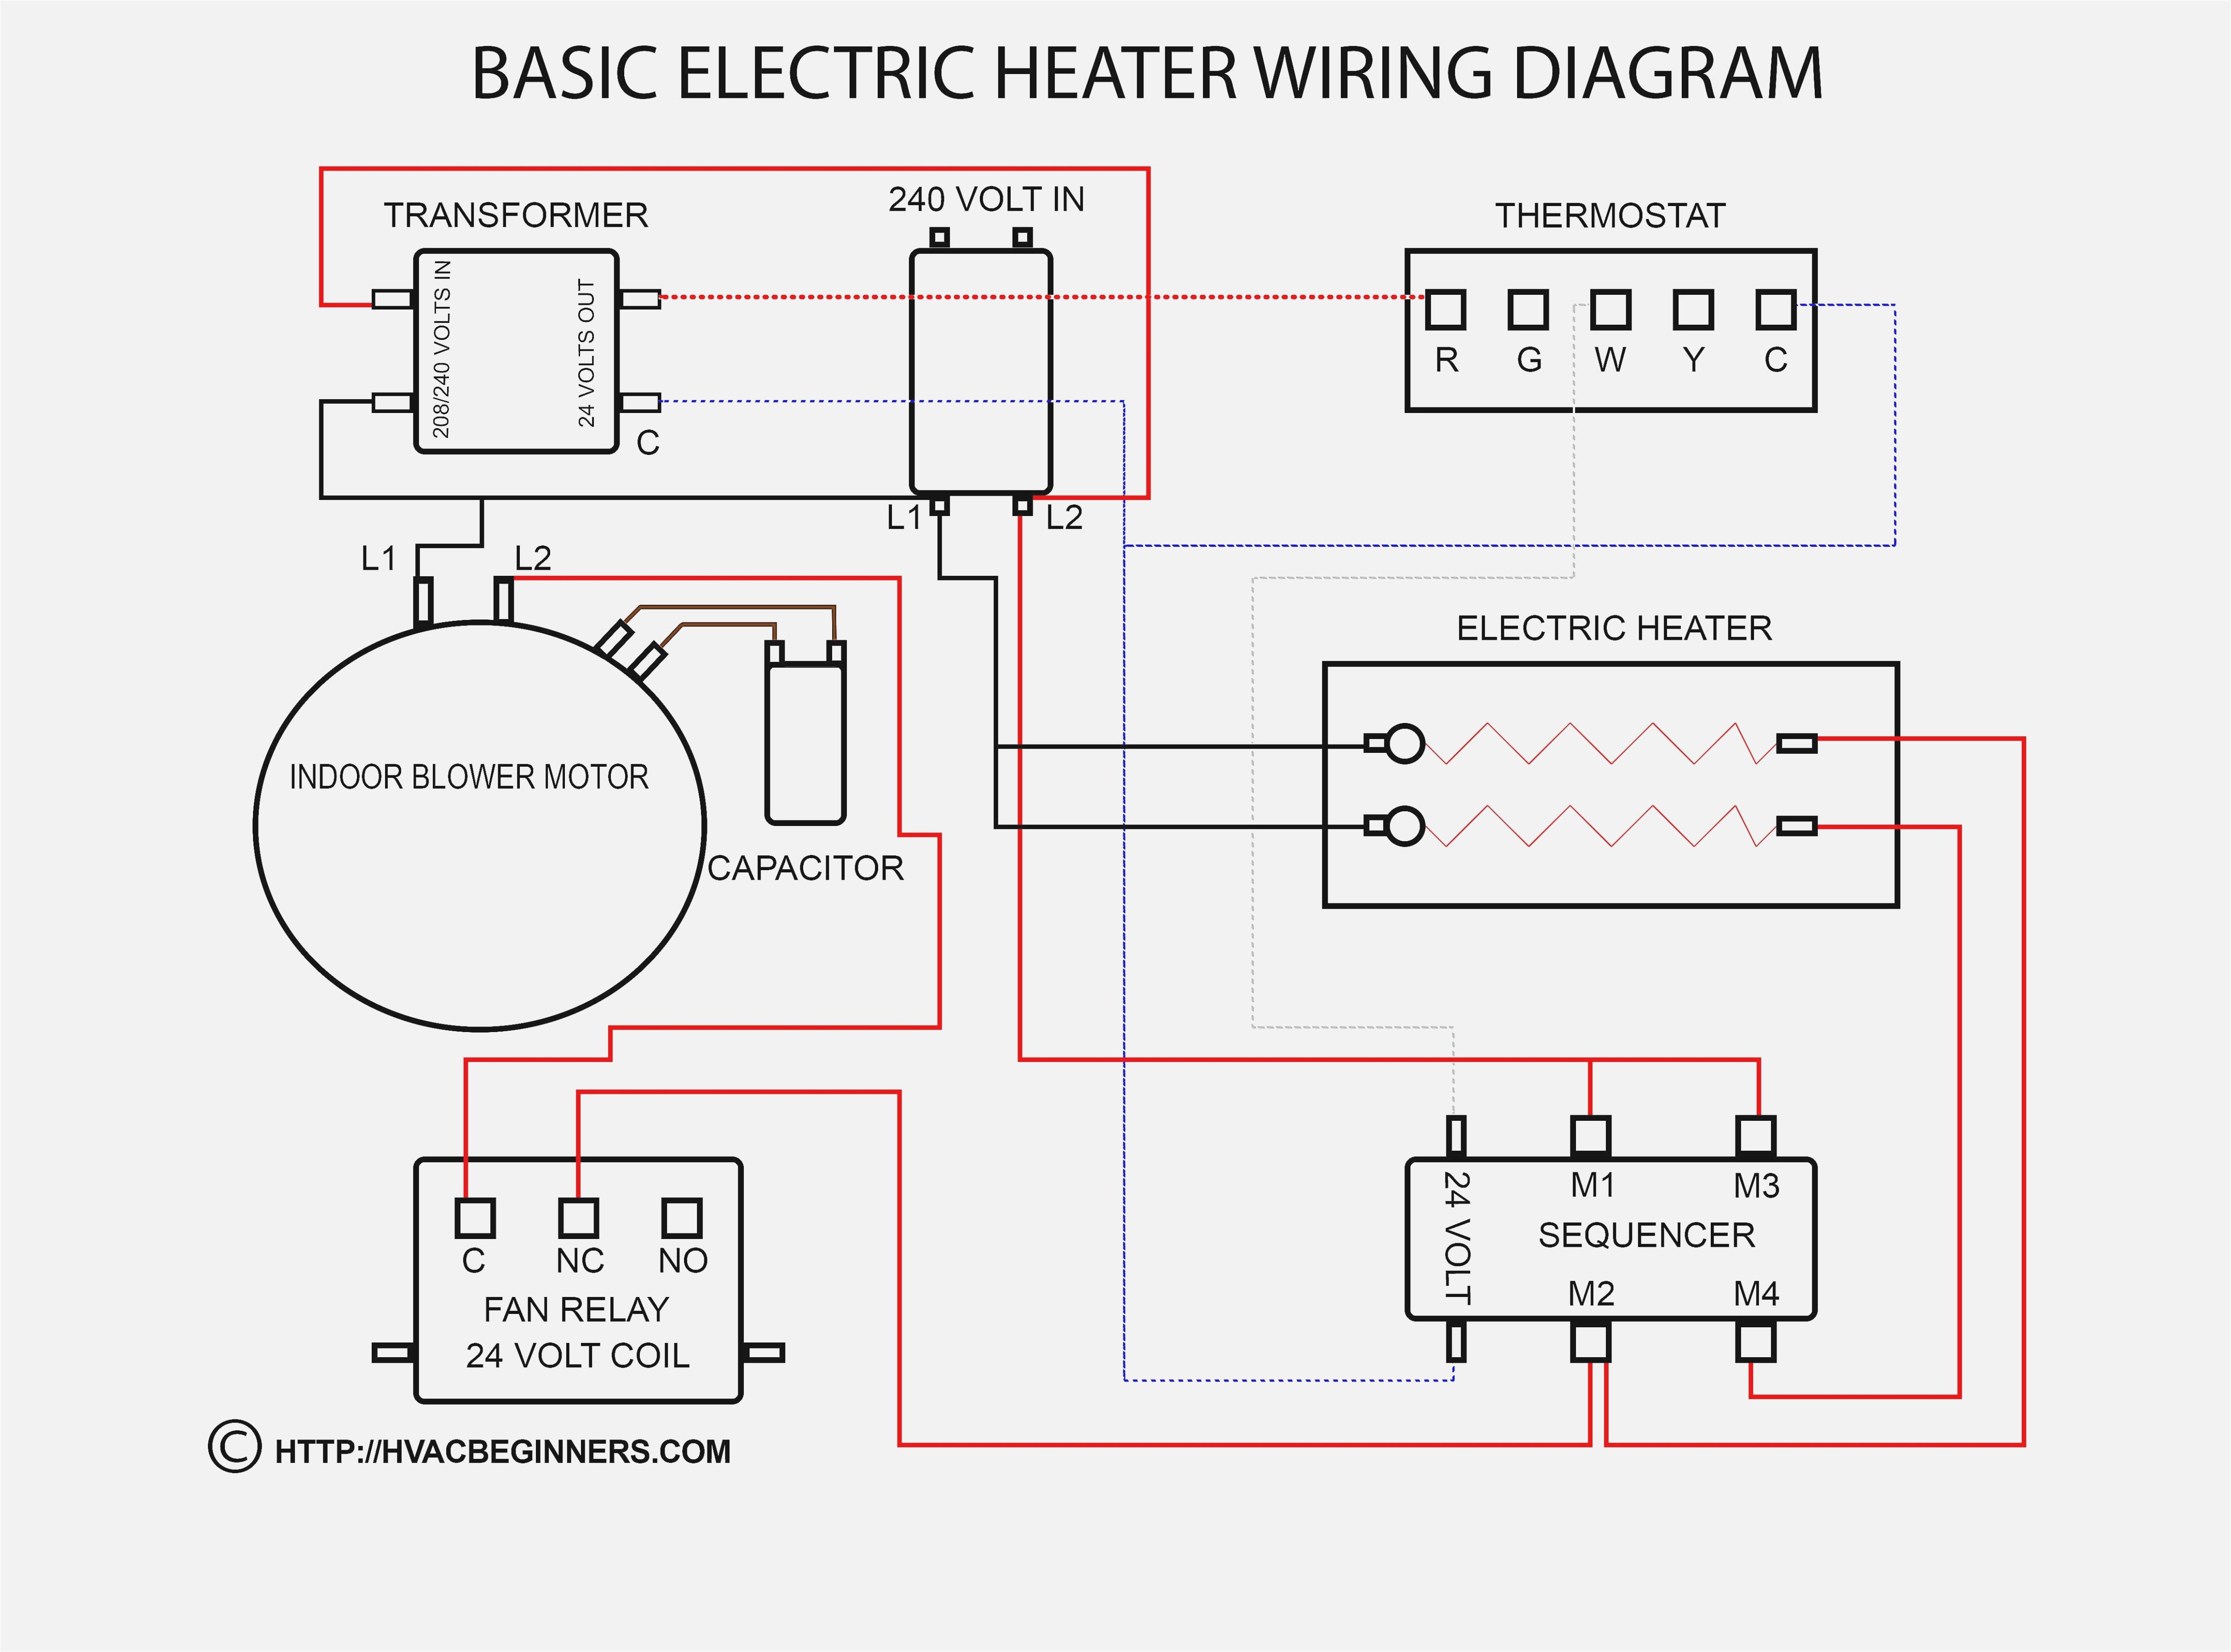 em wiring diagrams blog wiring diagram evaporator wiring diagram for tlf090